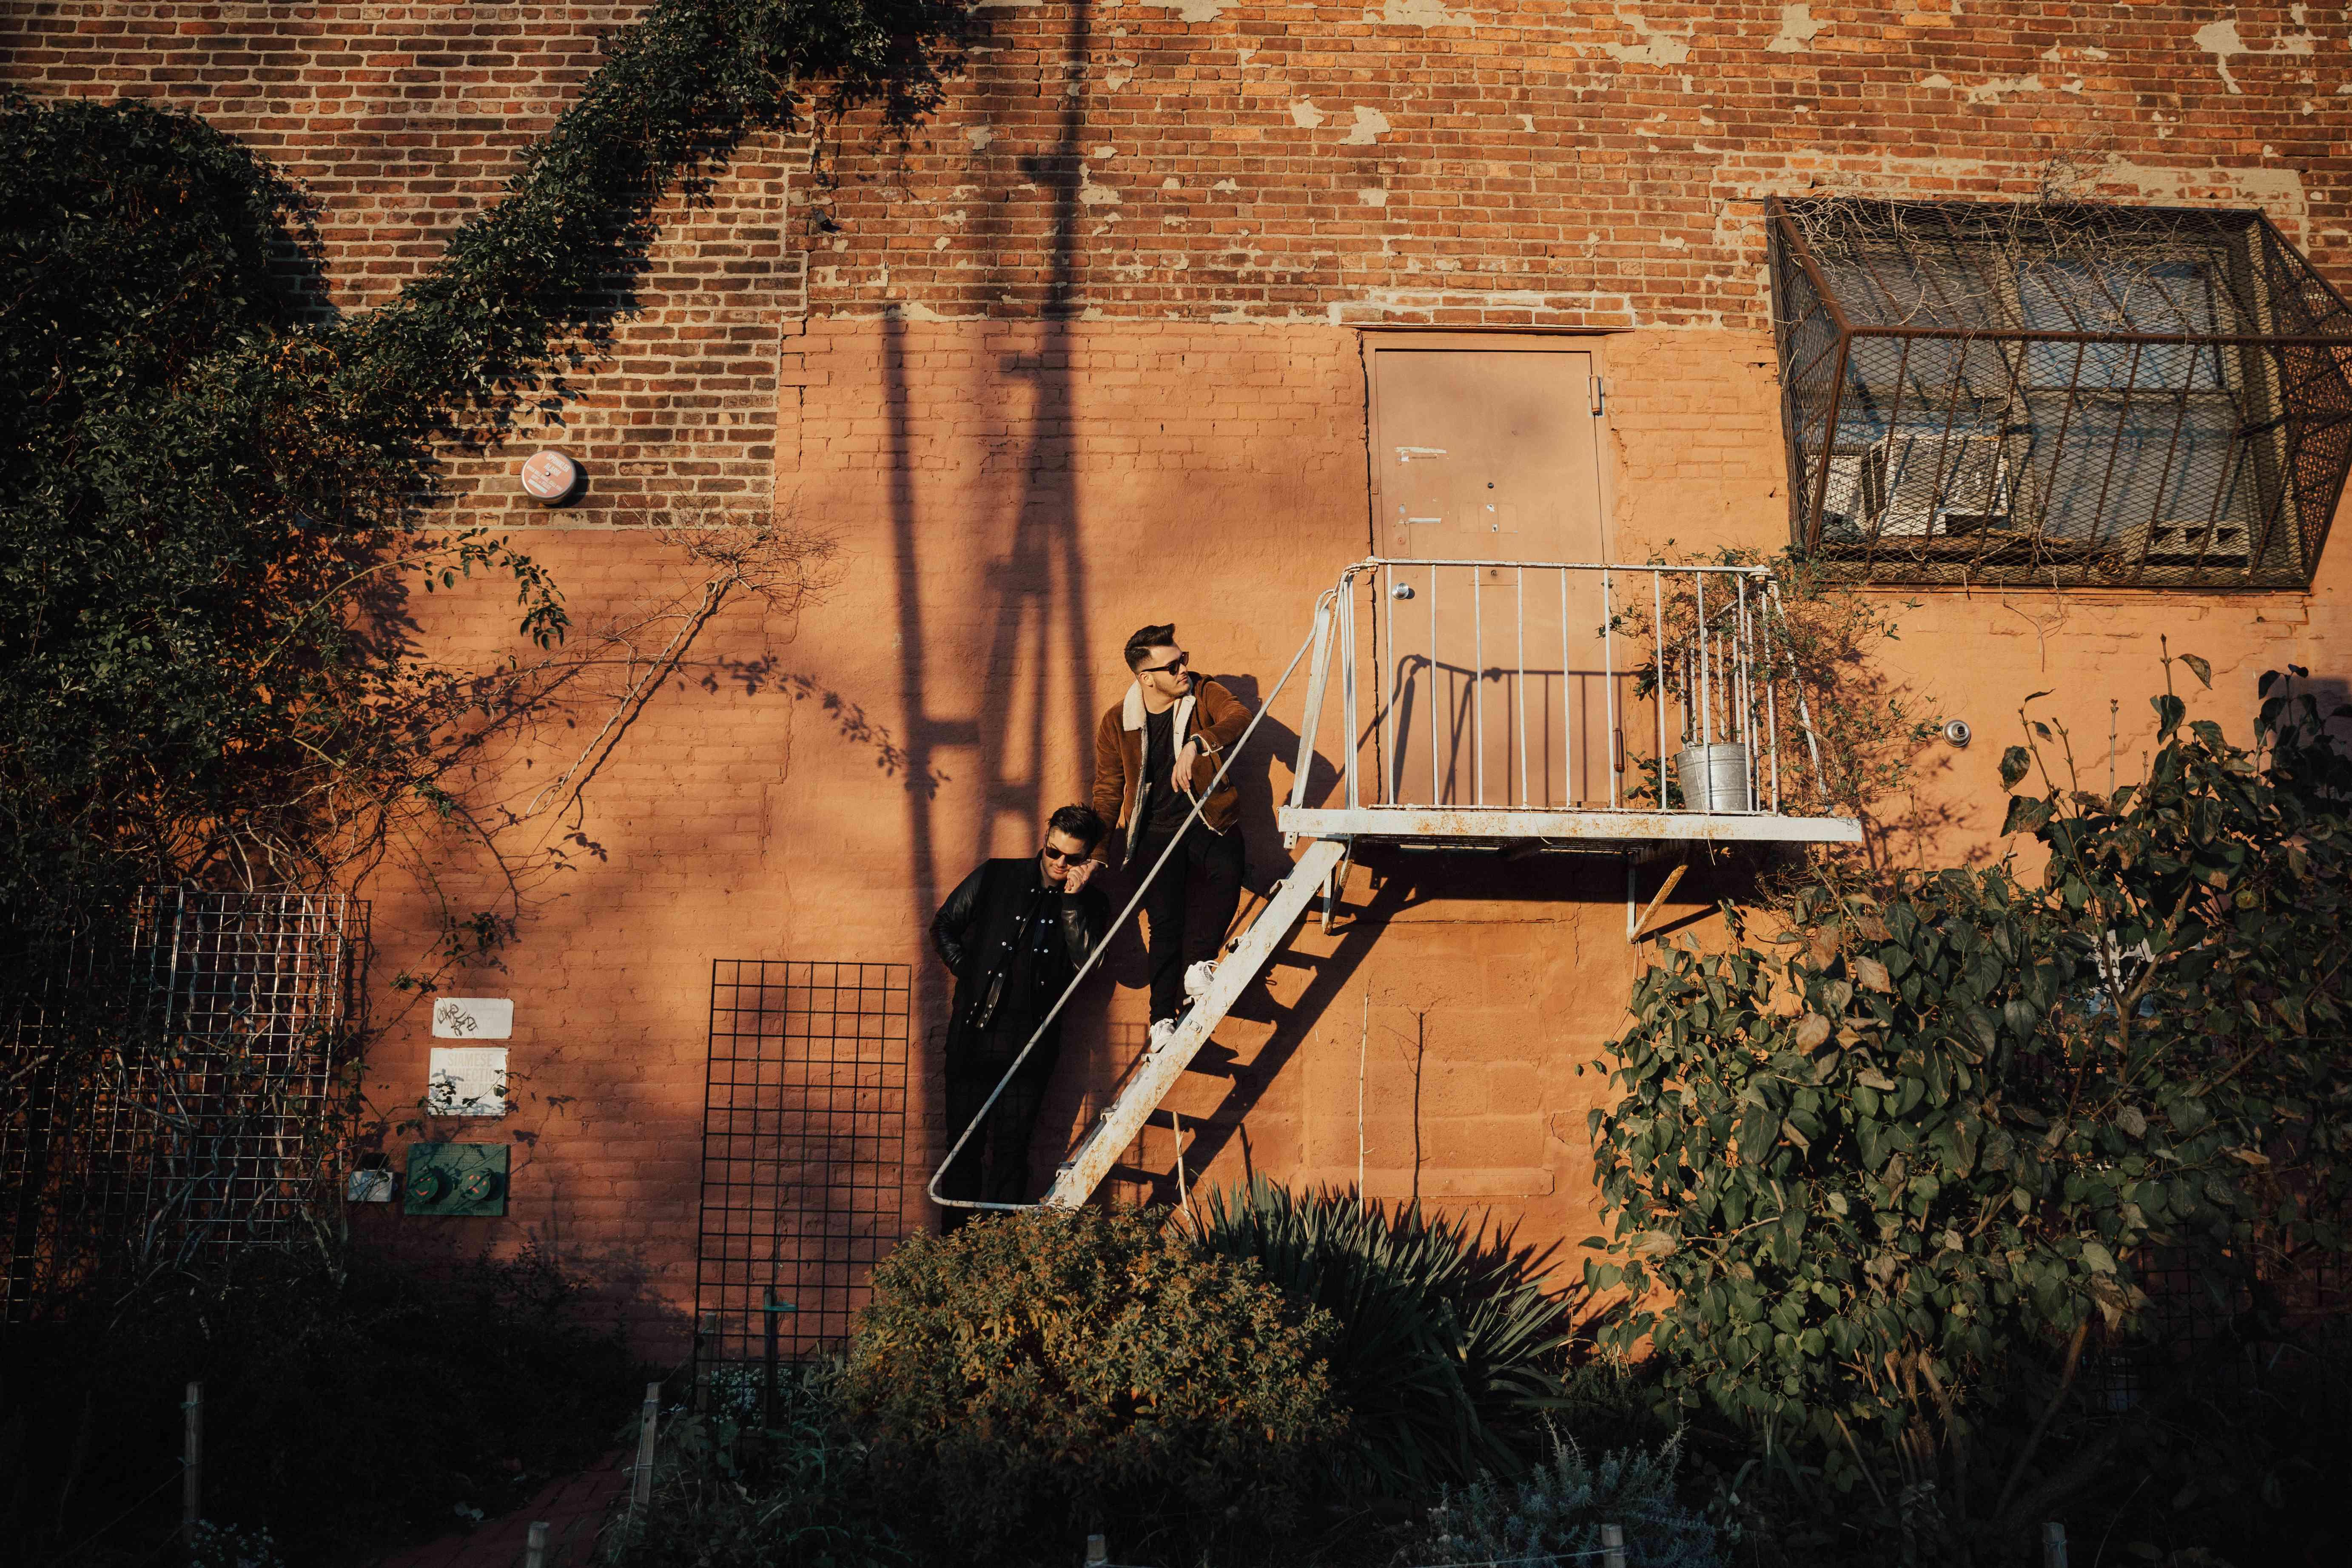 Couple on a fire escape